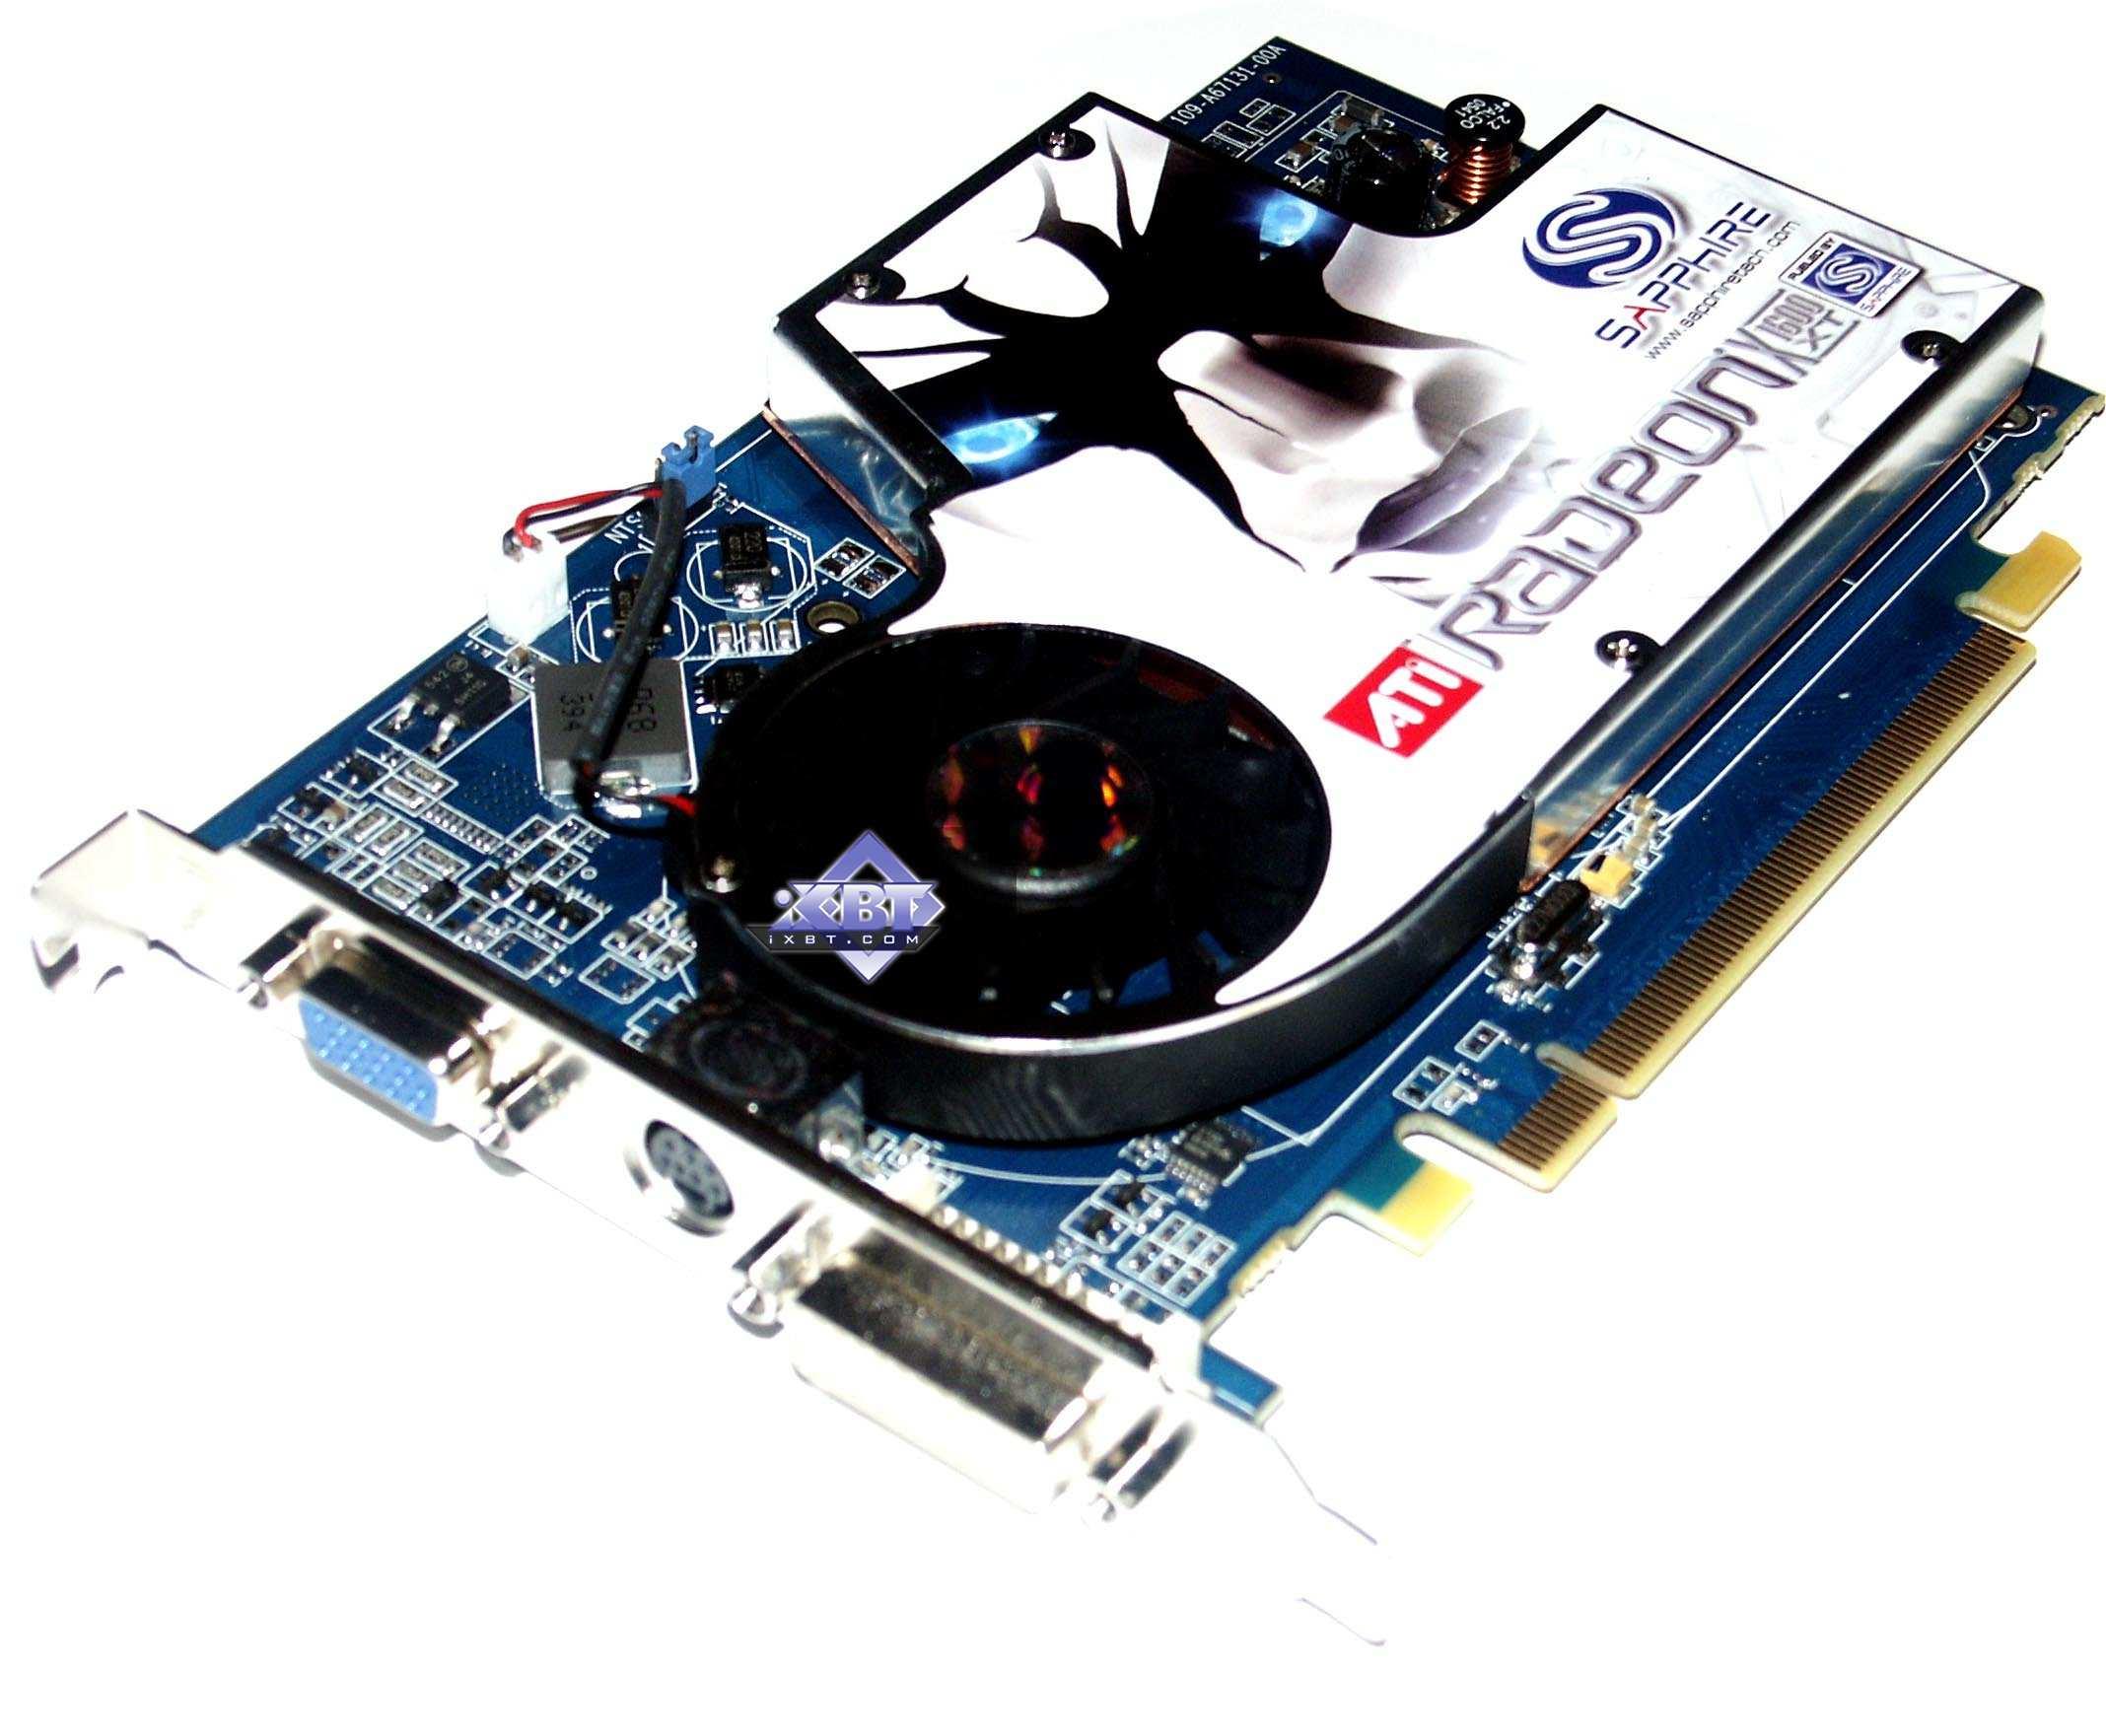 AMD/ATI Mobility Radeon X1600 drivers for Windows Vista 32bit (1 files)